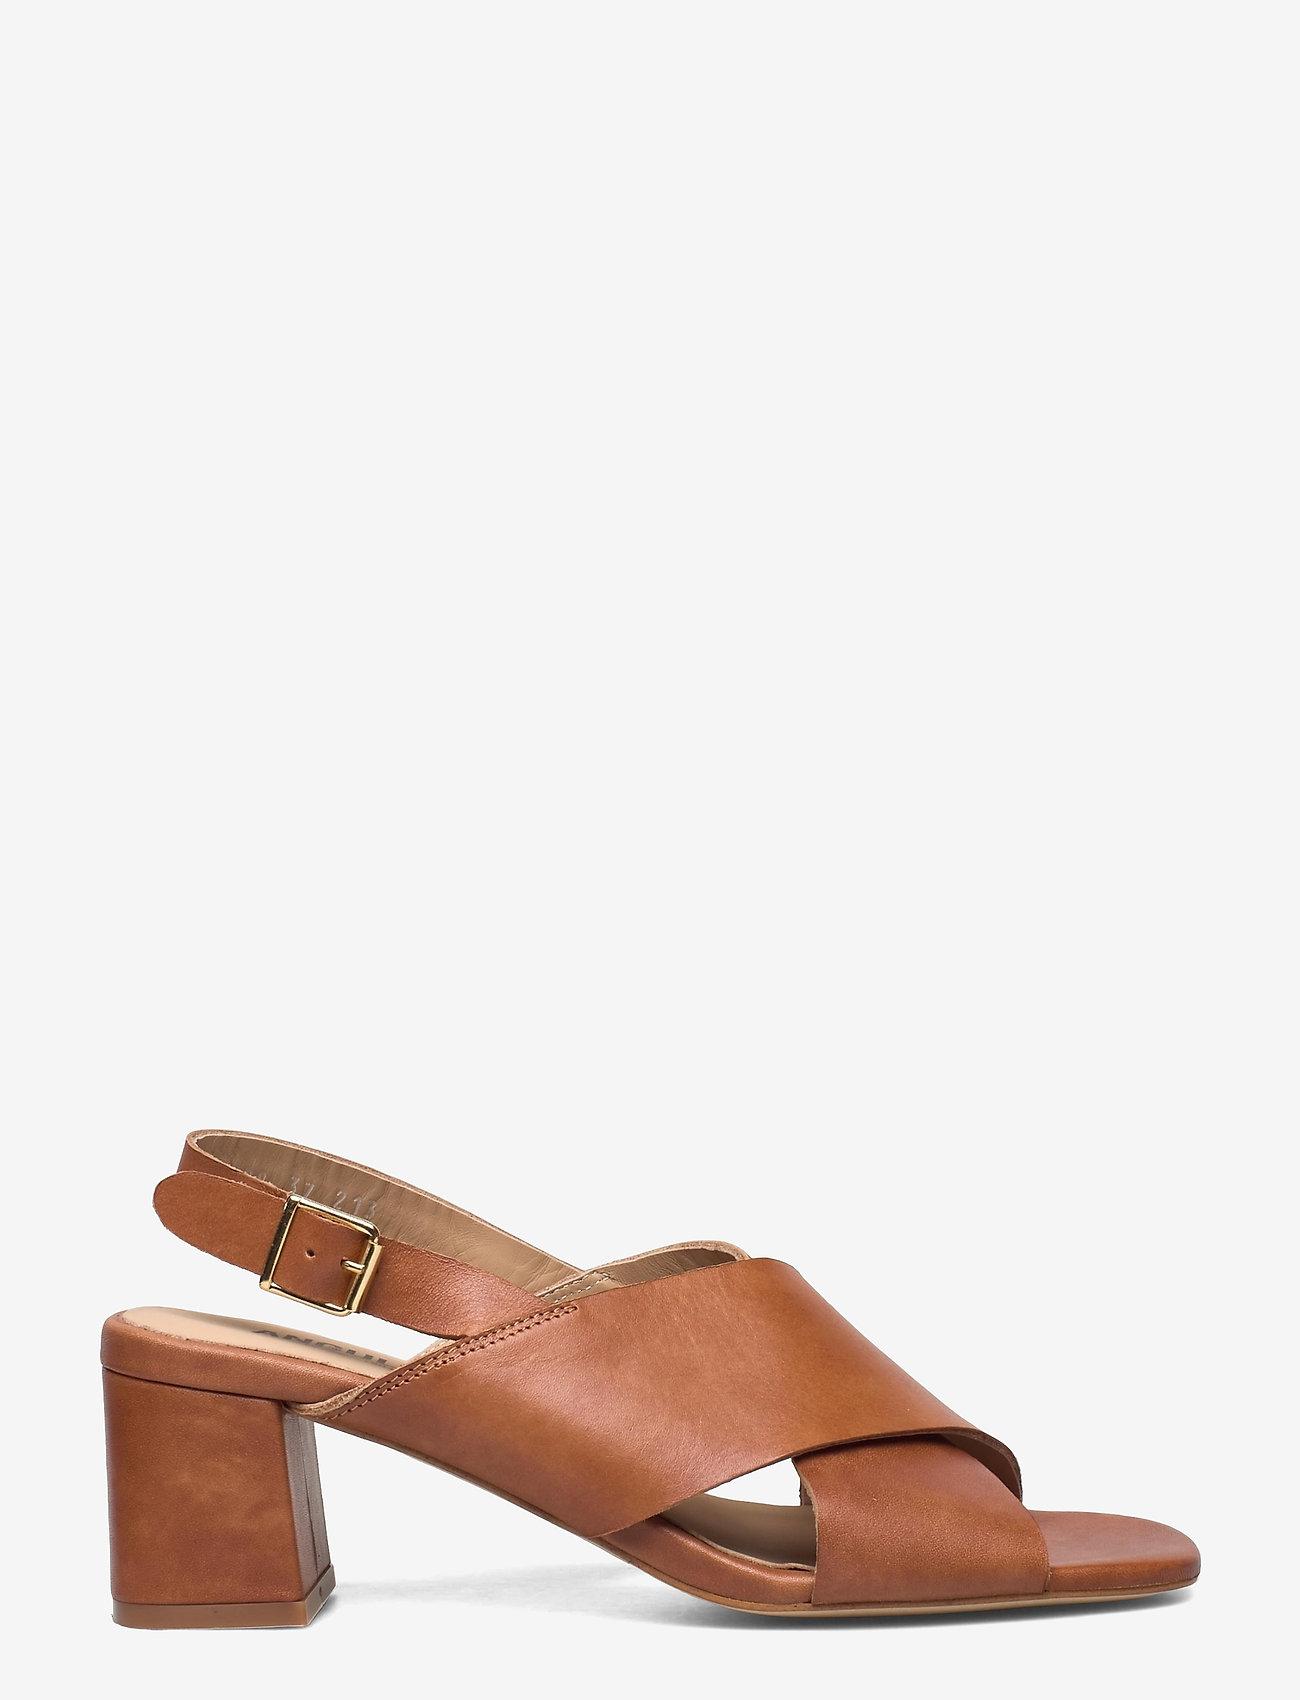 ANGULUS - Sandals - Block heels - sandalen mit absatz - 1789 tan - 1